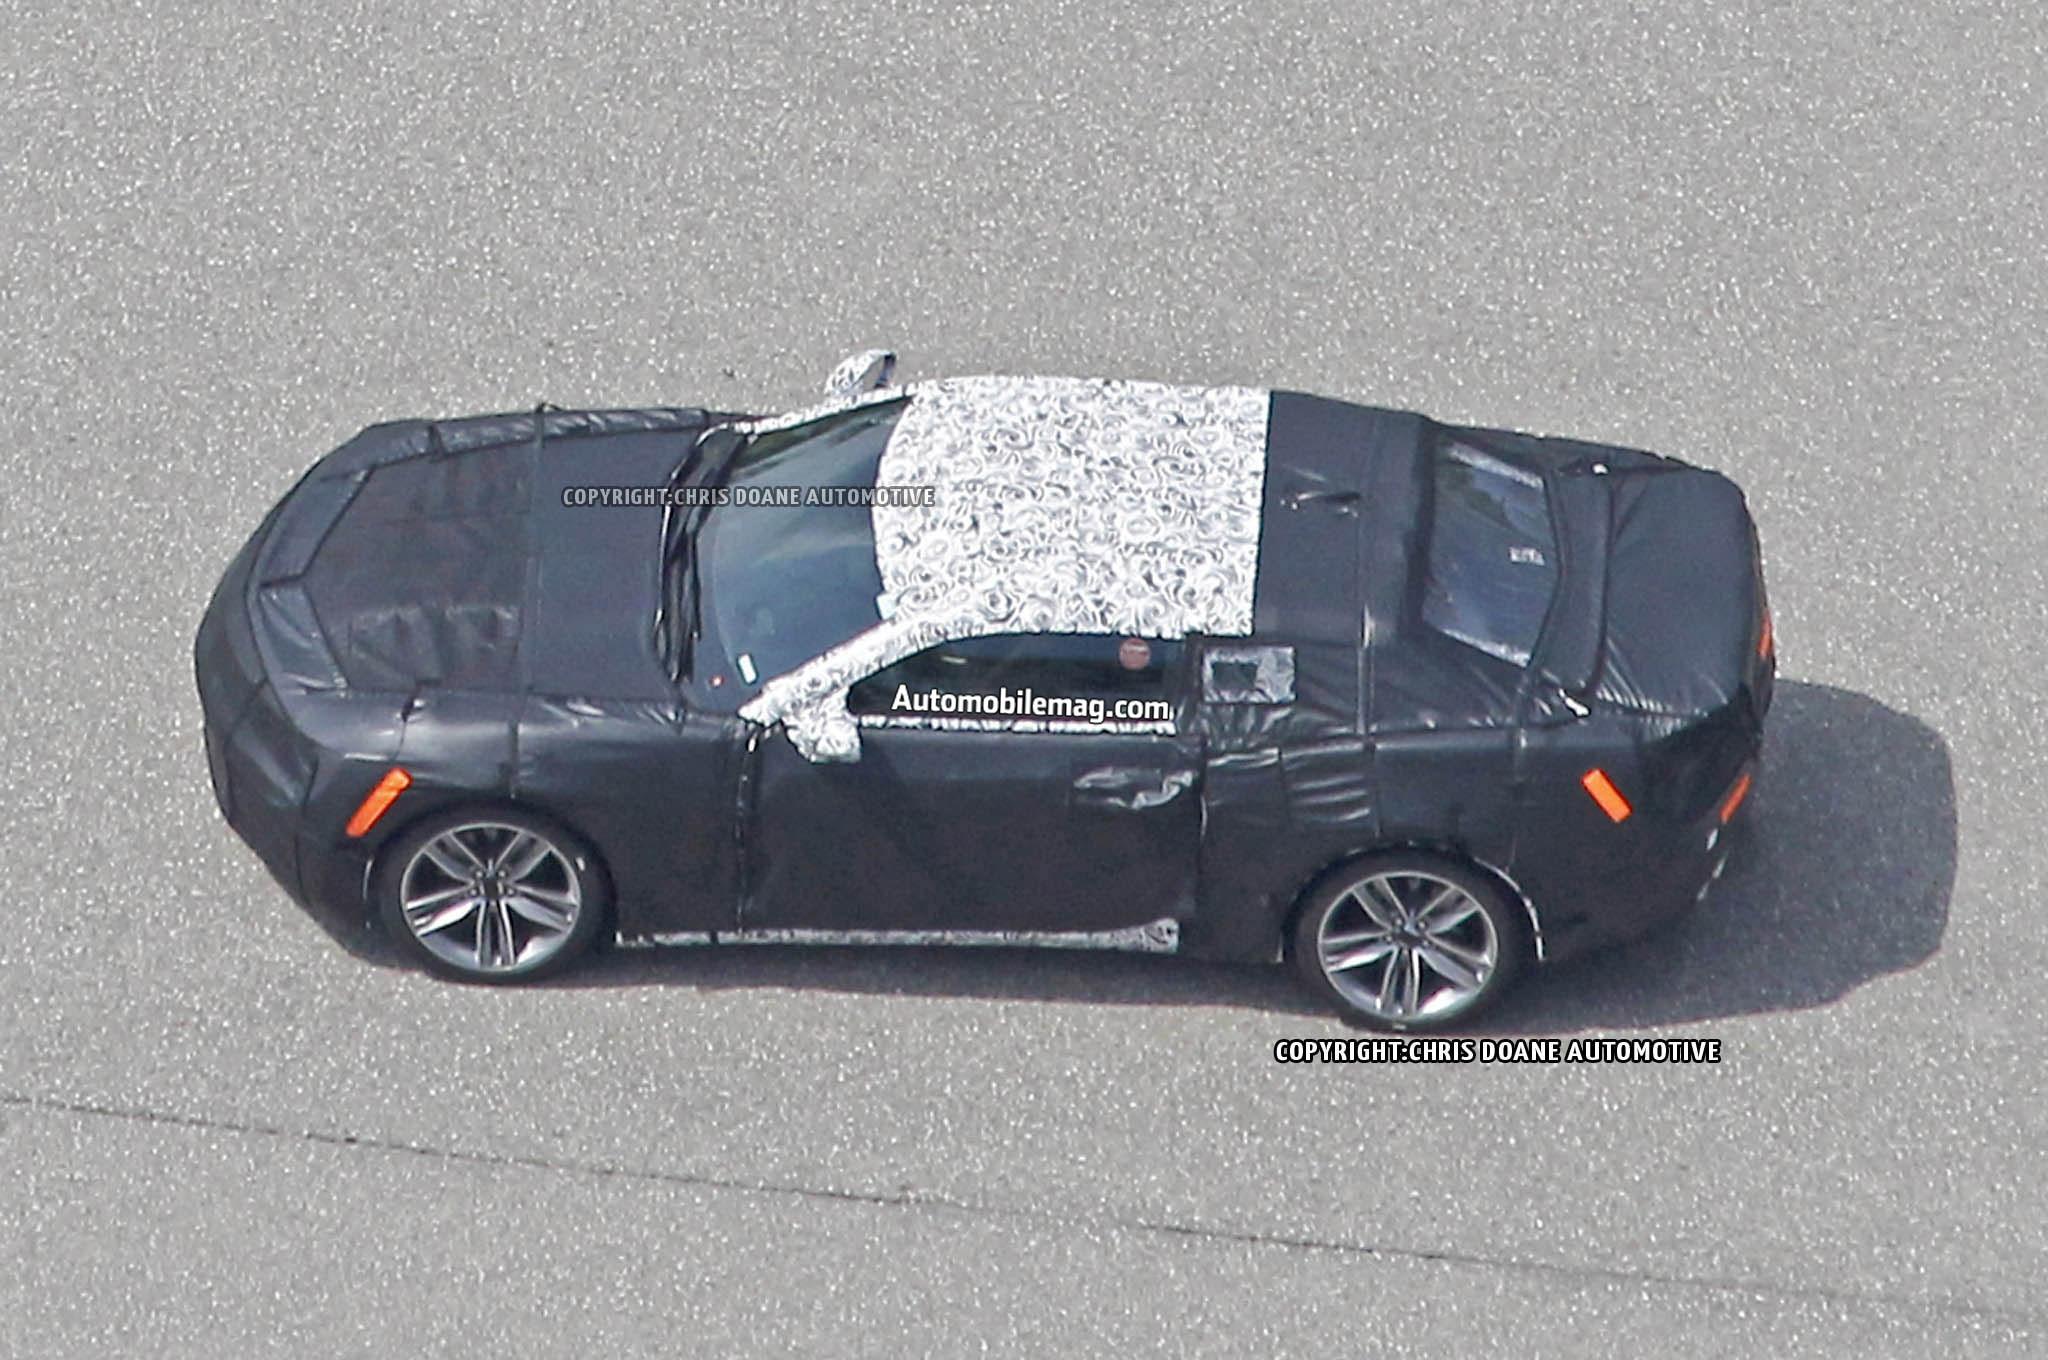 2016 Chevrolet Camaro ZL1 Prototype Side Profile 021